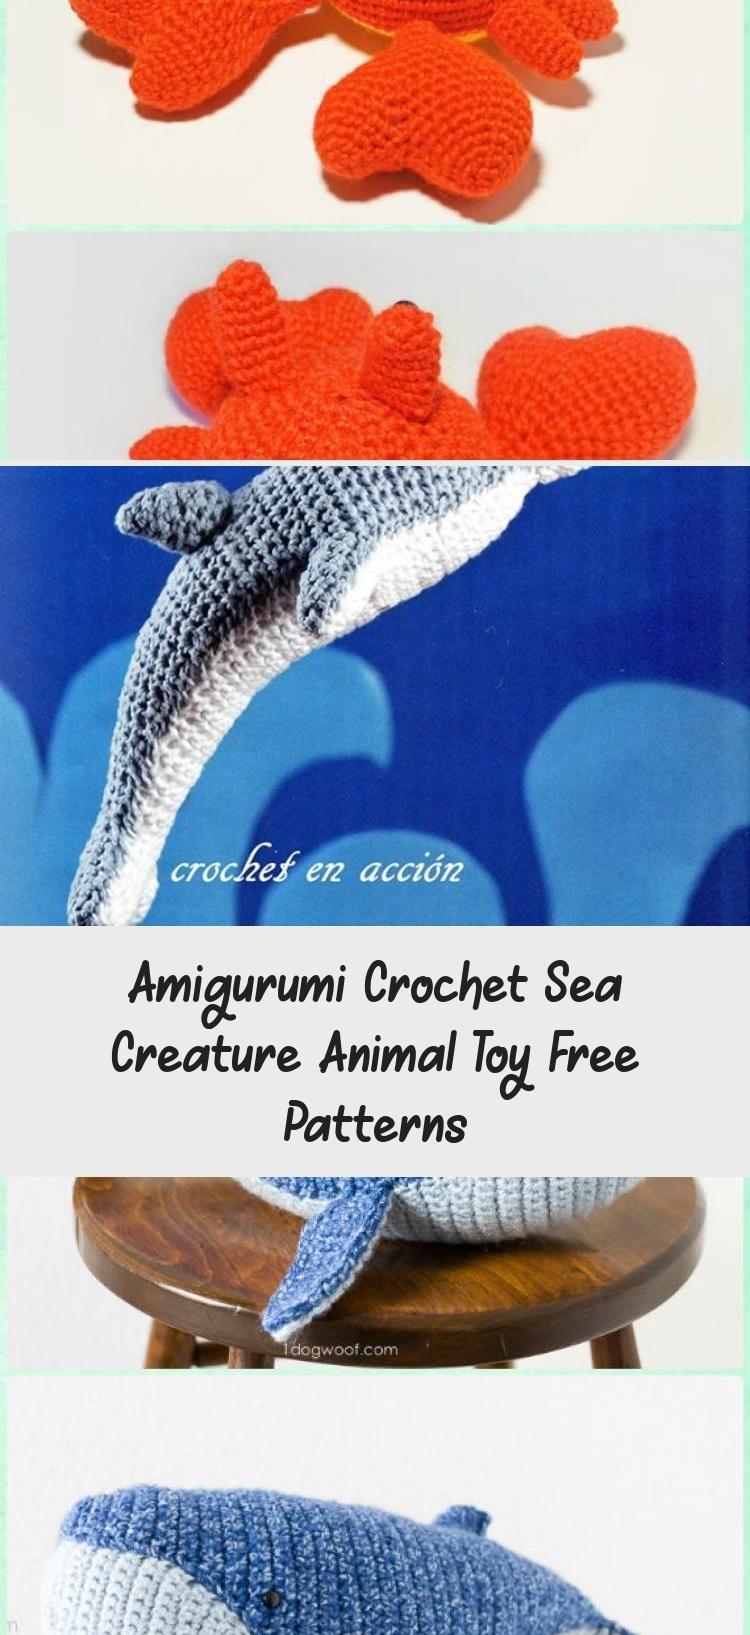 Baby Knitting Patterns Amigurumi Crochet Sea Creature Animal Toy Free  Patterns: Cro... | 1635x750